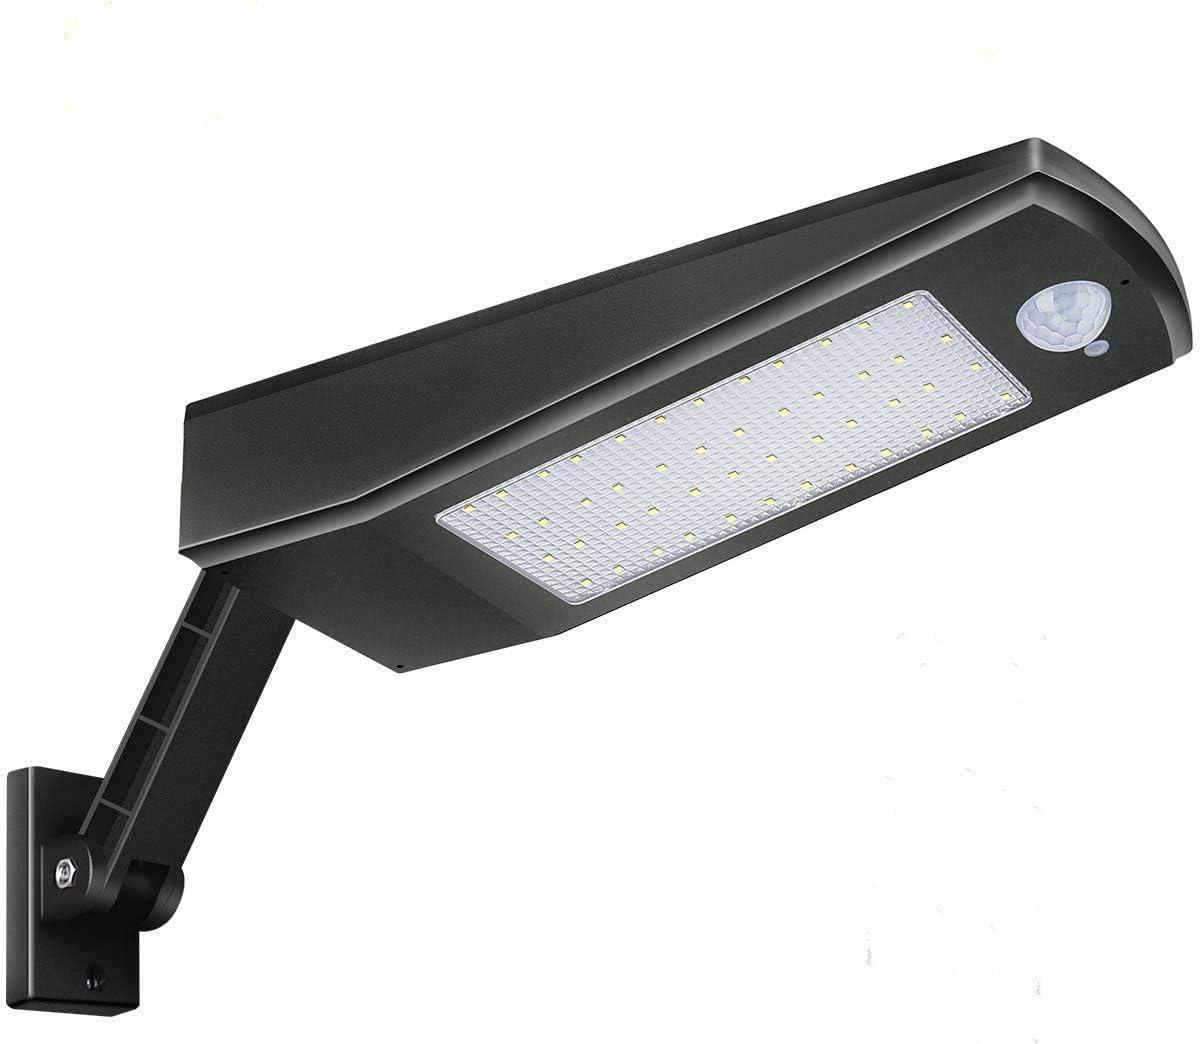 Solar Lights Outdoor, LED Street Lights, Security Motion Sensor, AIMENGTE Solar Powered Landscape Light Wall Lamp IP65 Waterproof, 900lm 48LEDs. Black Shell, White